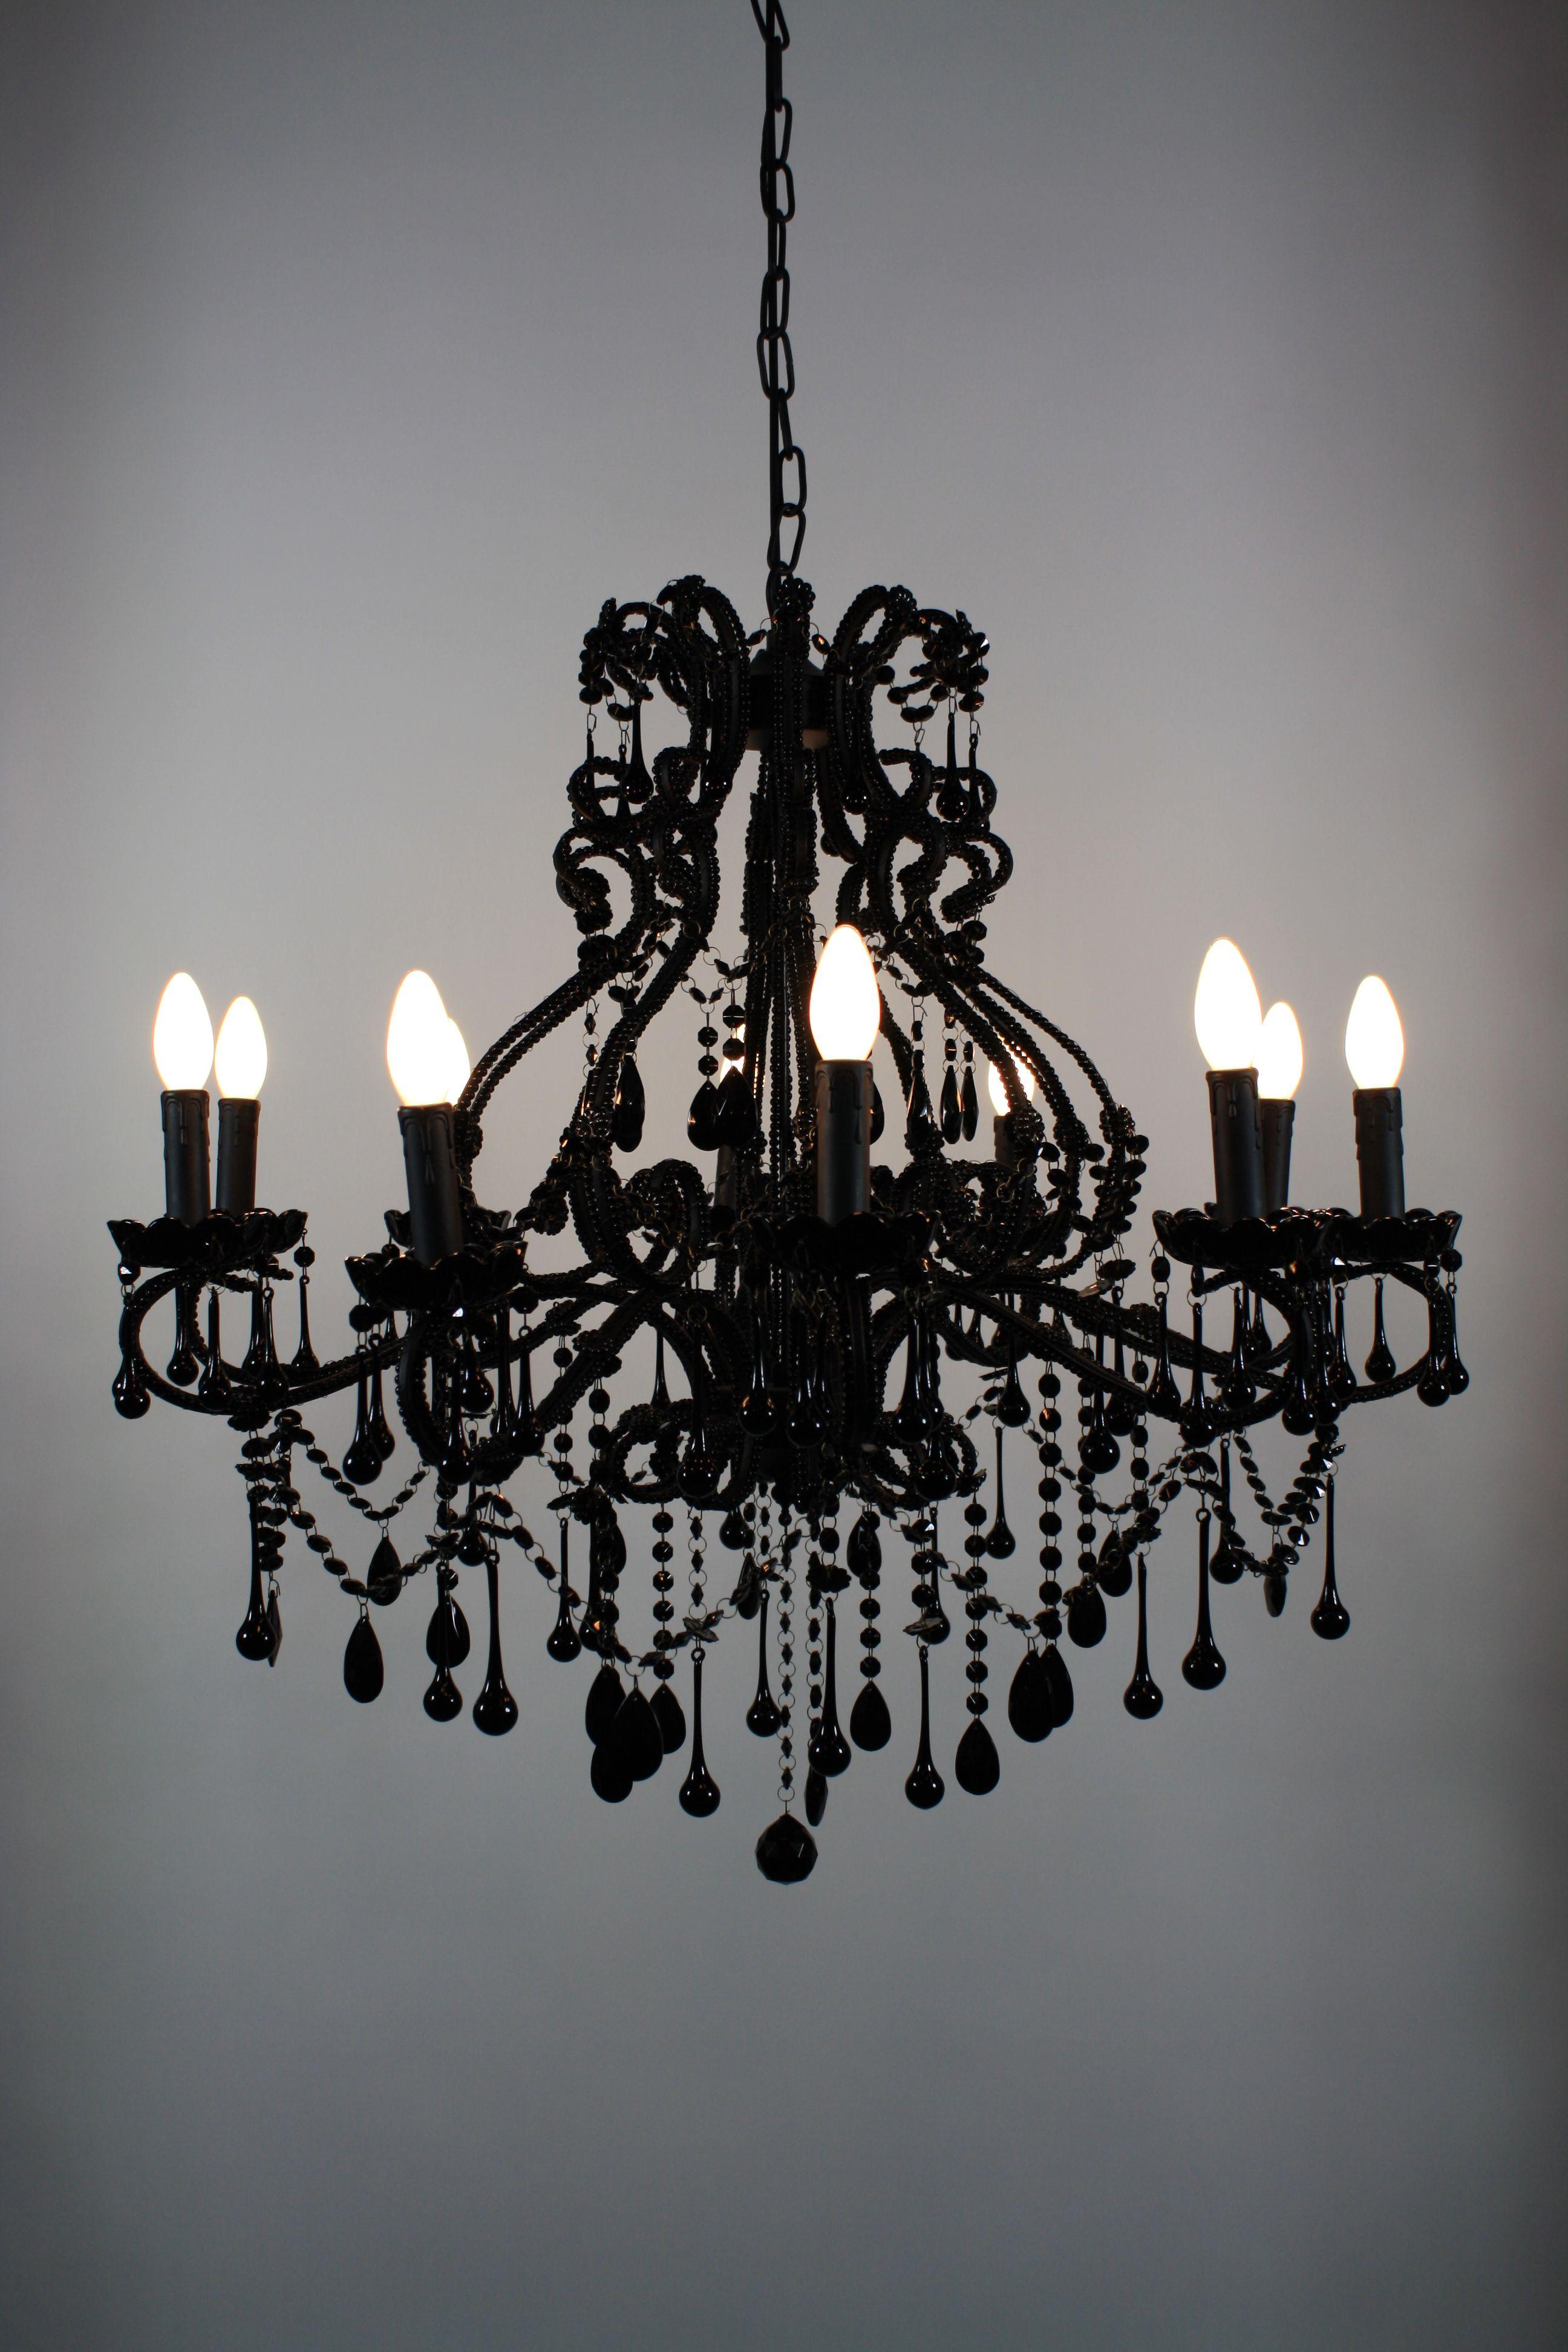 Goth Chandelier Black Vintage Chandelier – Small Black Chandeliers